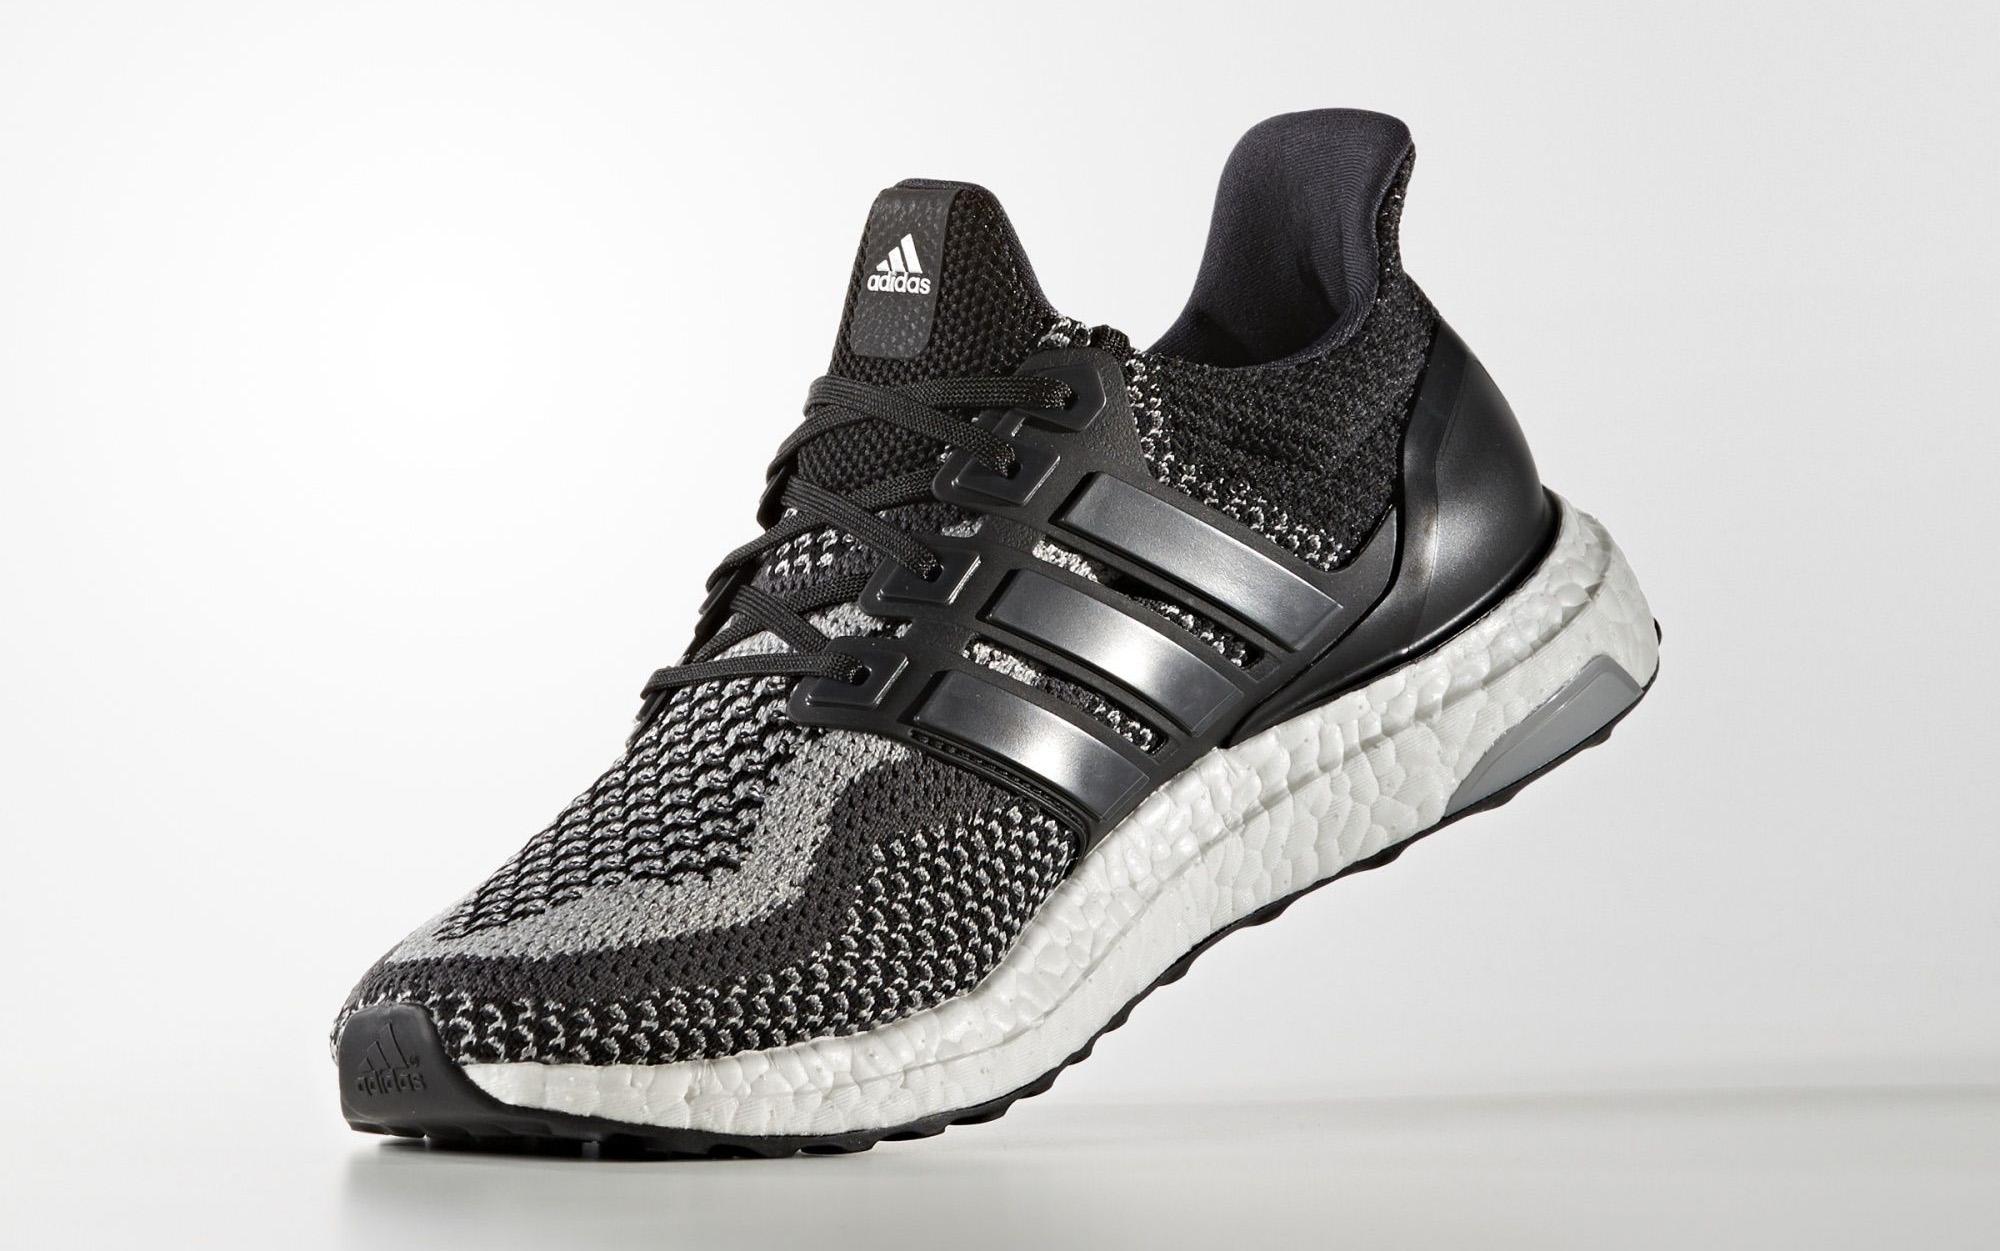 adidas ultra boost 0 triple black, Adidas new womens adipure